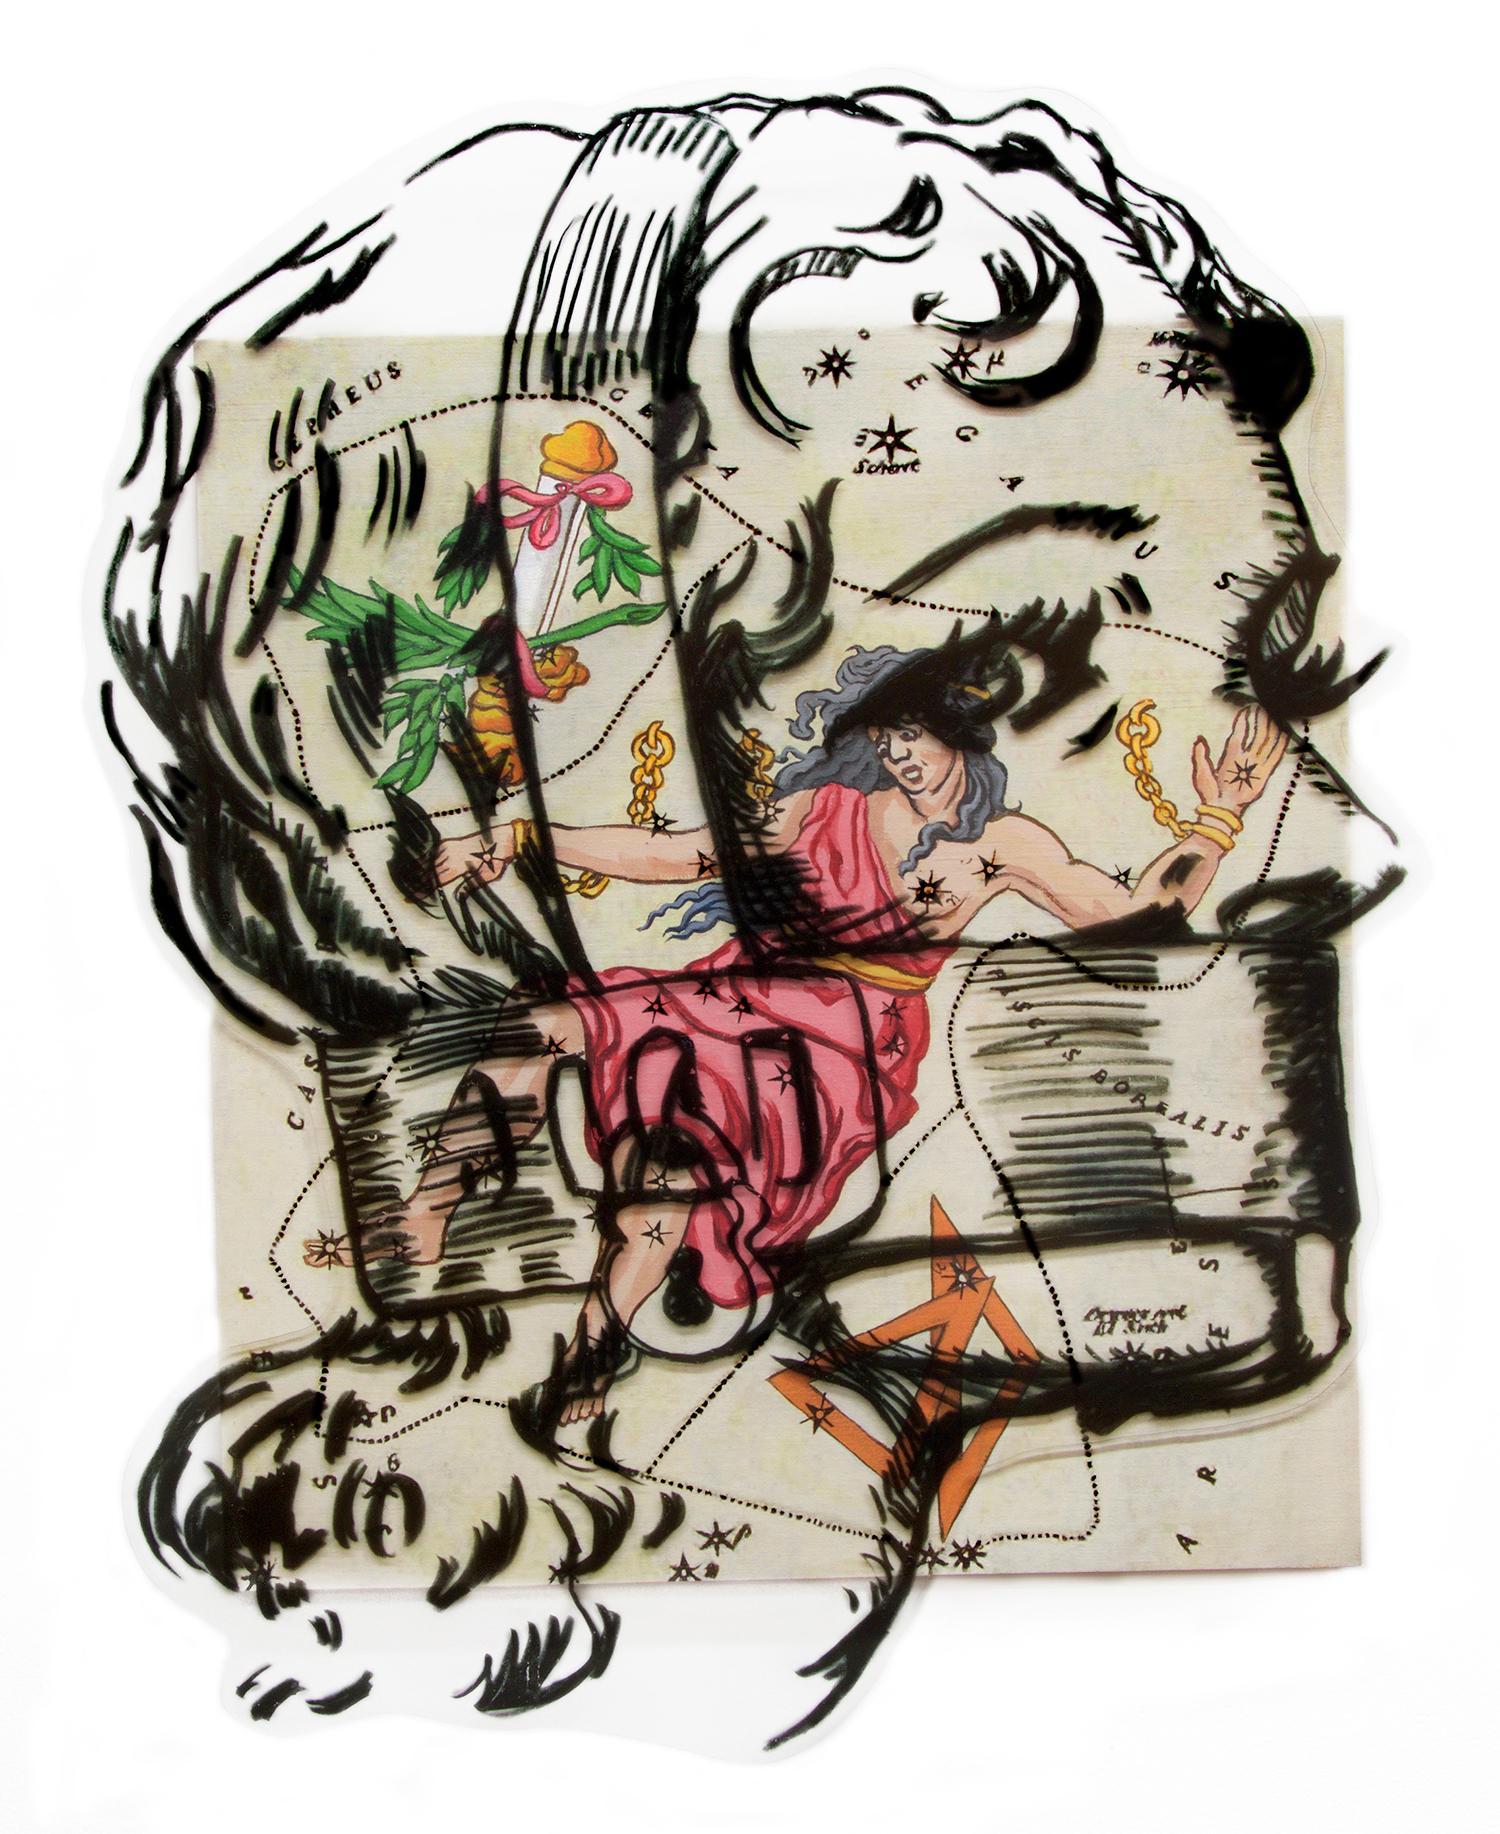 Pamela Joseph, Cosmic Woman, Andromedia